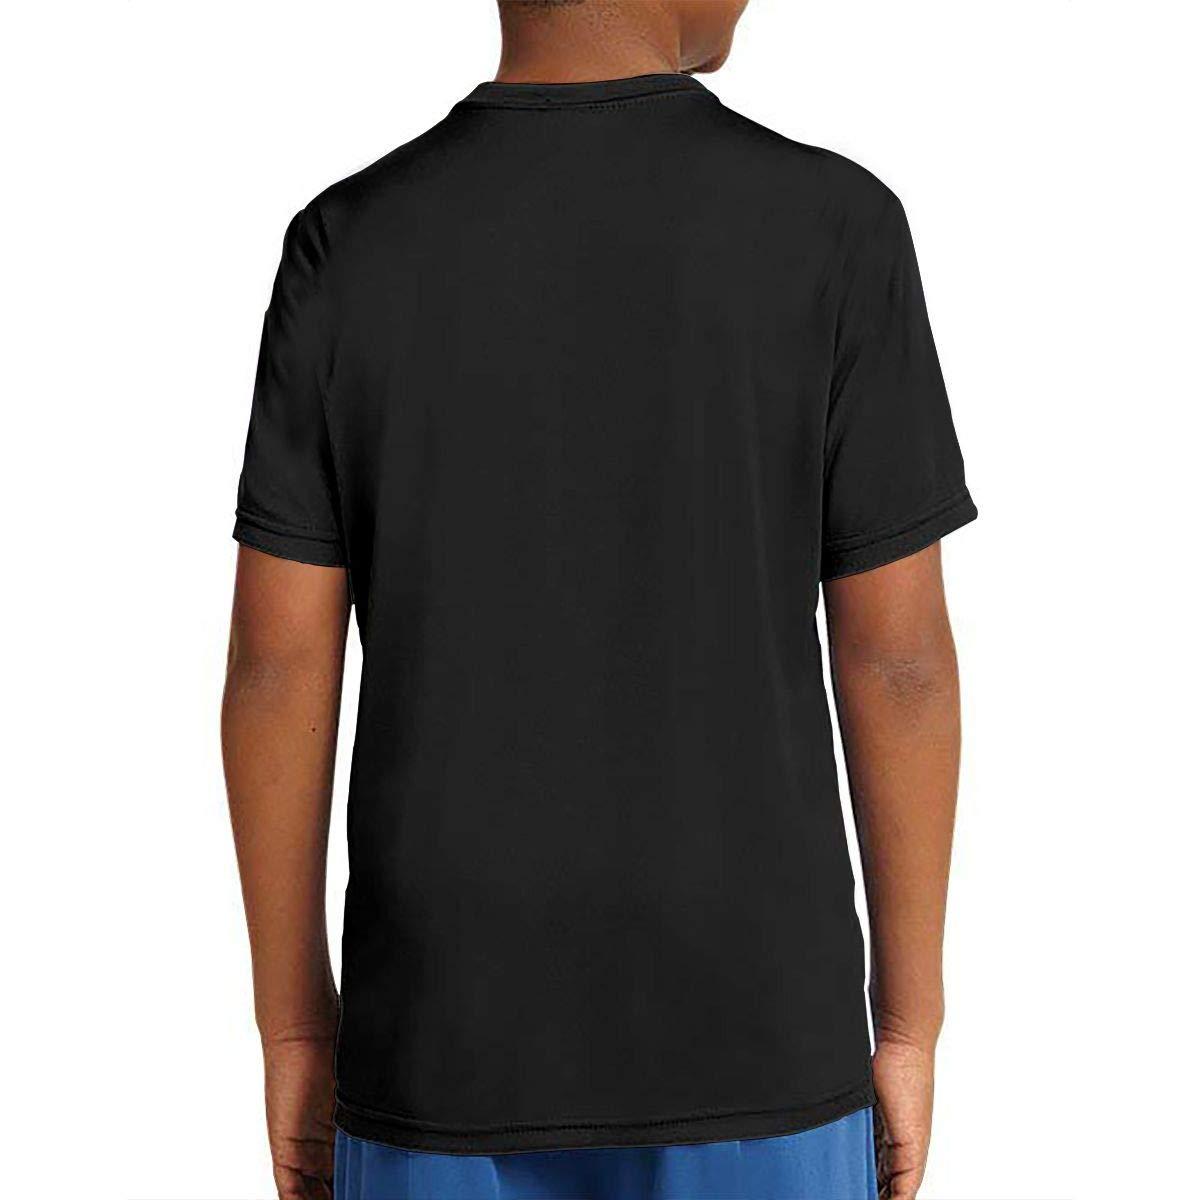 Music Kyo-ka and Den-ki Kids T Shirt 3D Printed Short Sleeve Fashion Casual Youth Tees Shirts for Girls Boys Children